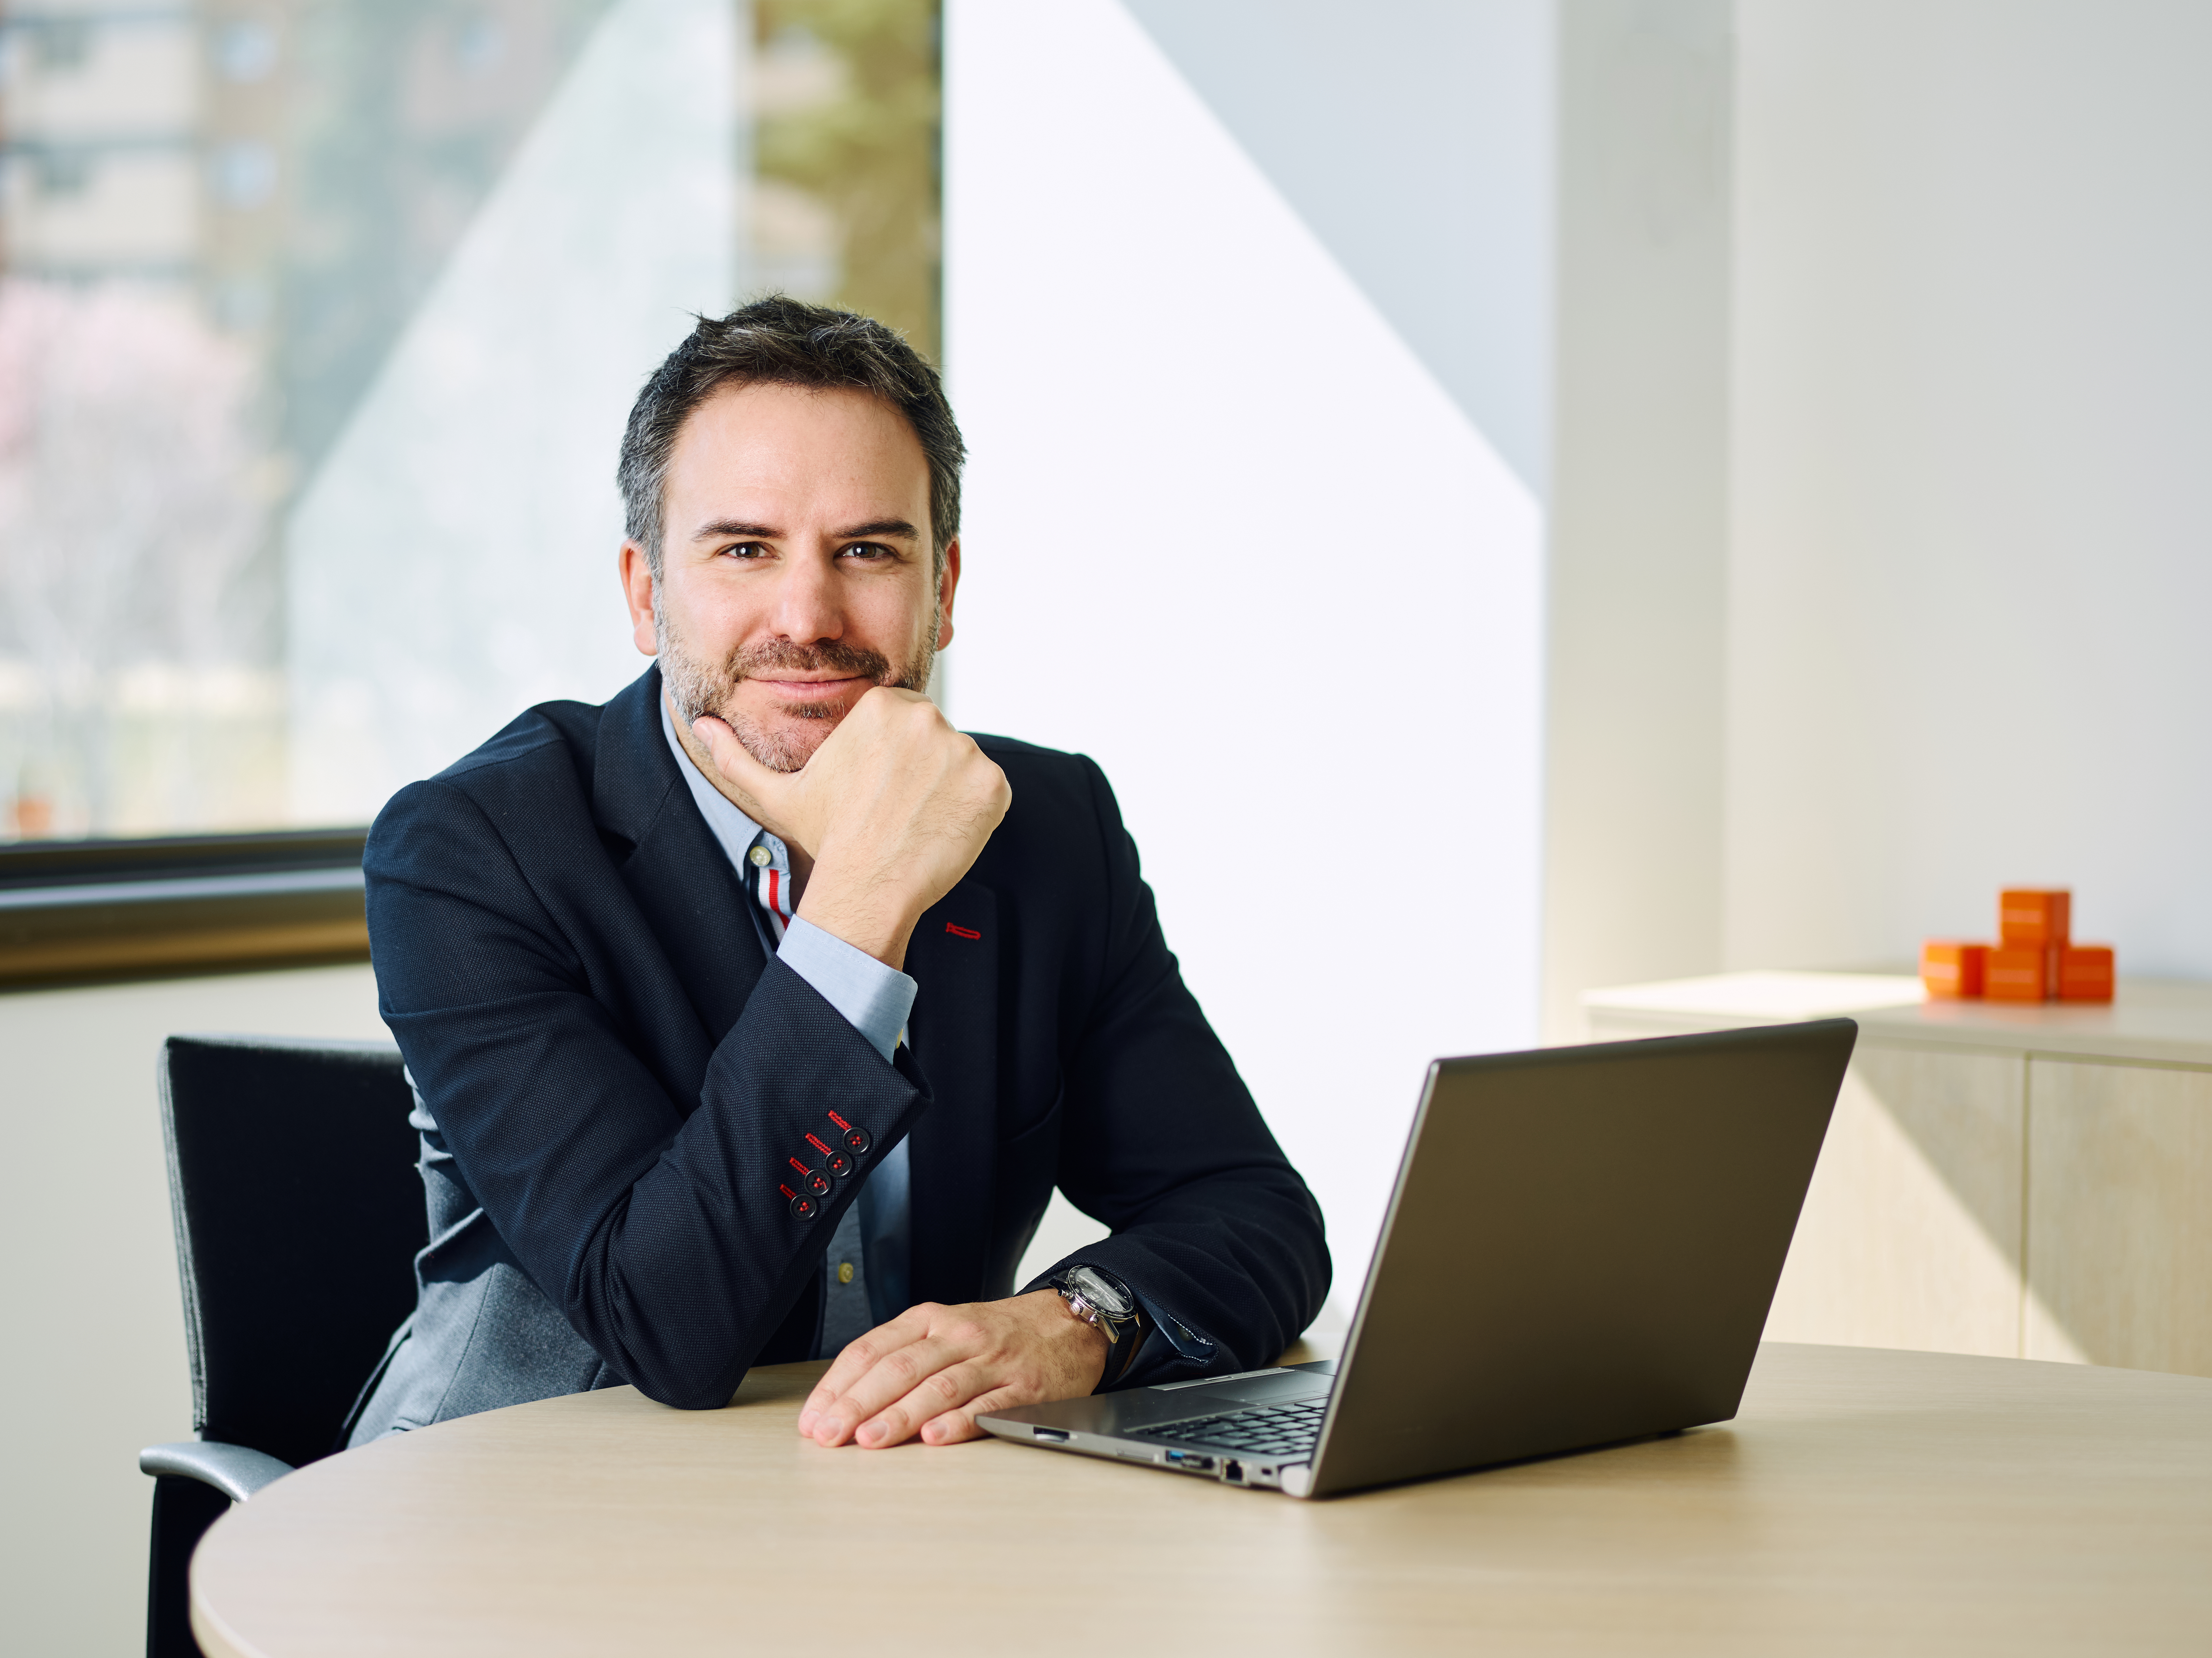 Norberto Villarrasa, Director General de Kyowa kirin España